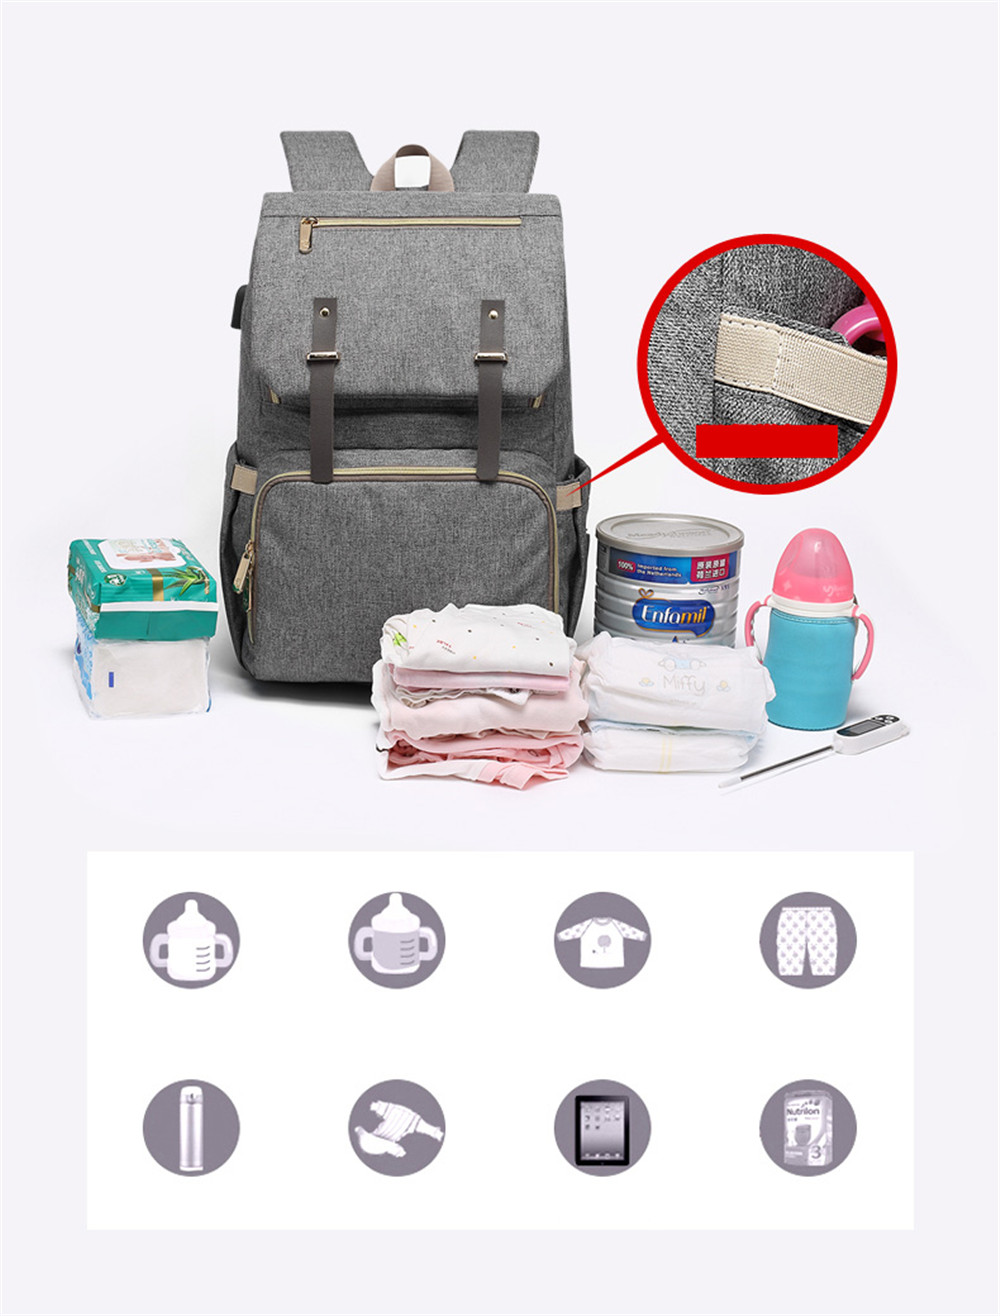 HTB1G7sCafjsK1Rjy1Xaq6zispXaK Fashion Large Capacity Baby Nappy Bag Diaper Bag Purse Multifunction USB Mummy Travel Backpack Women Nursing Bags For Mom Daddy